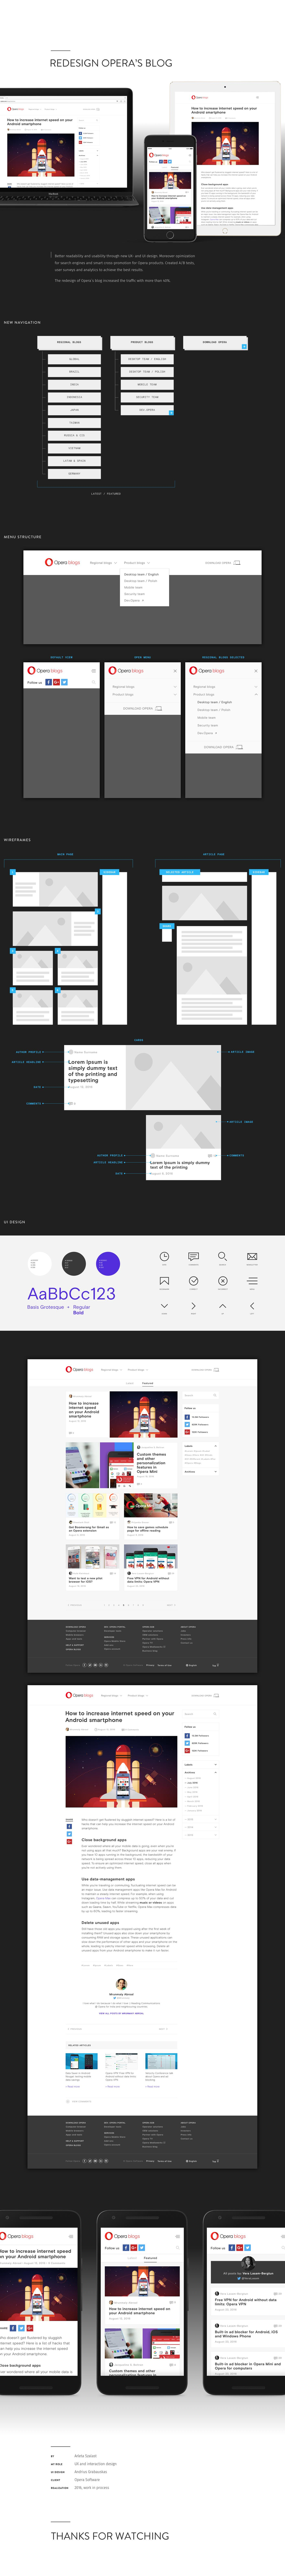 ux uxdesign Interaction design  ui design information architecture  Blog redesign SEO Web design